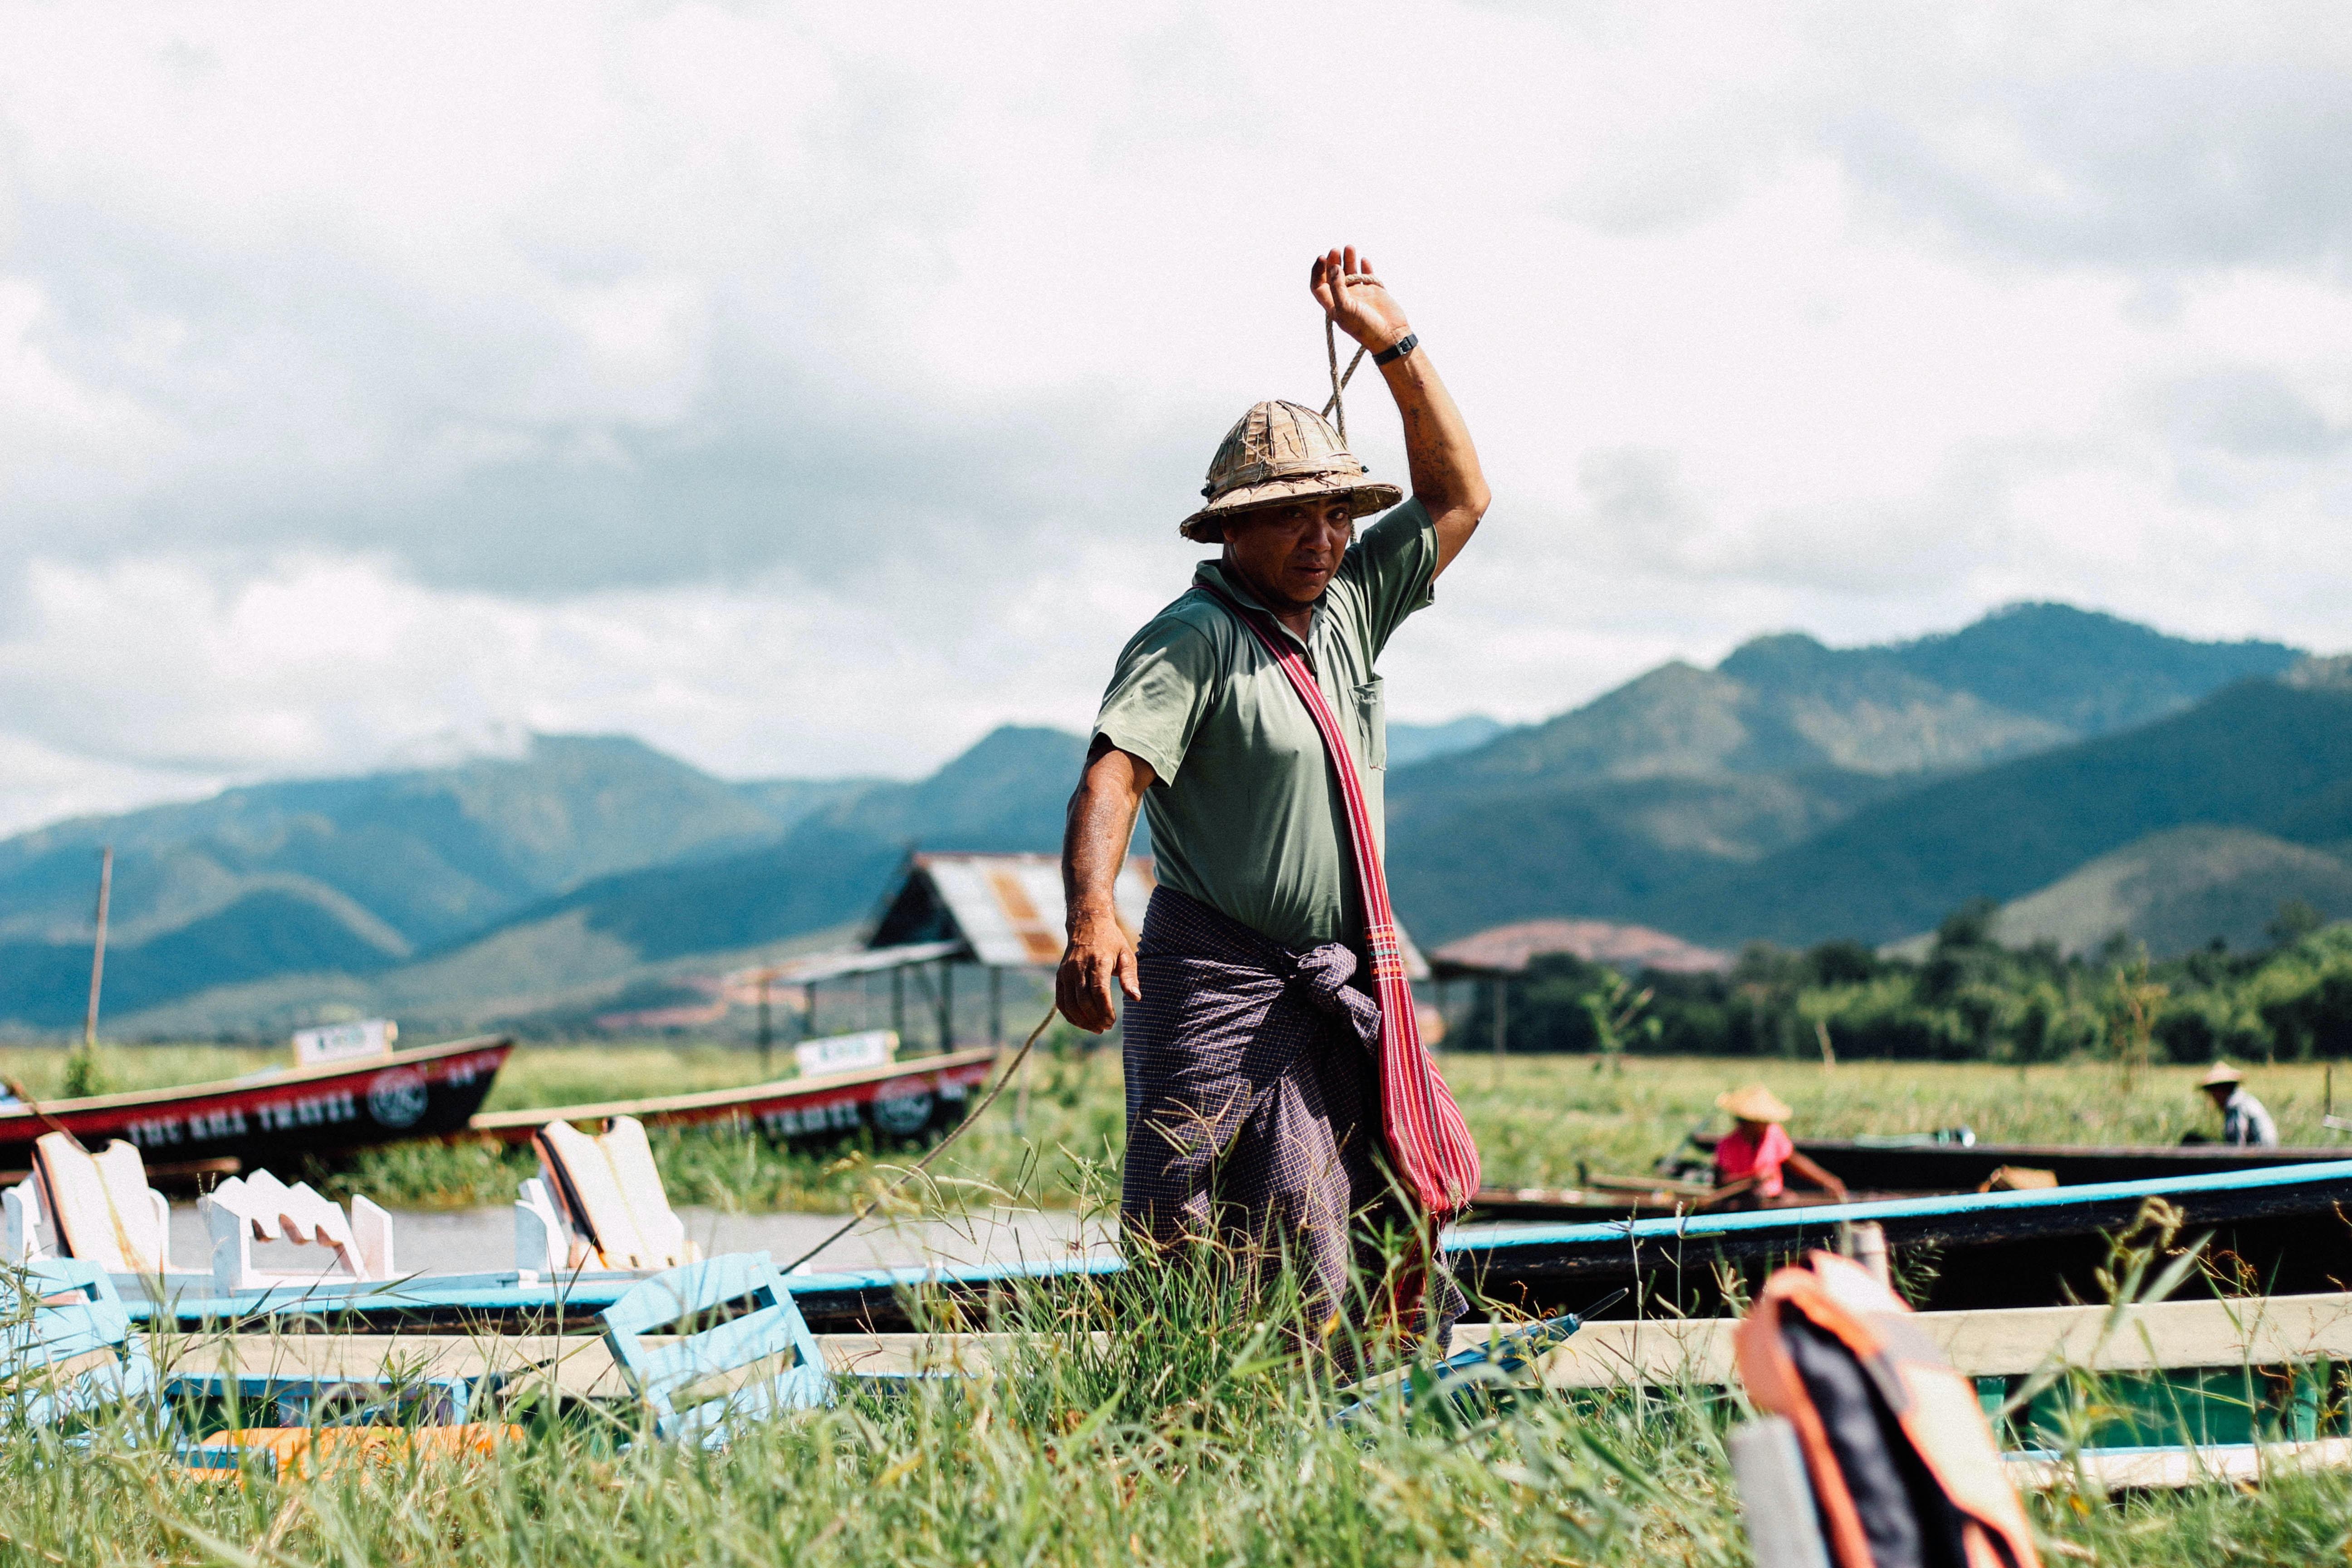 A fisherman wearing a hat preparing his fishing boat in Inle Lake